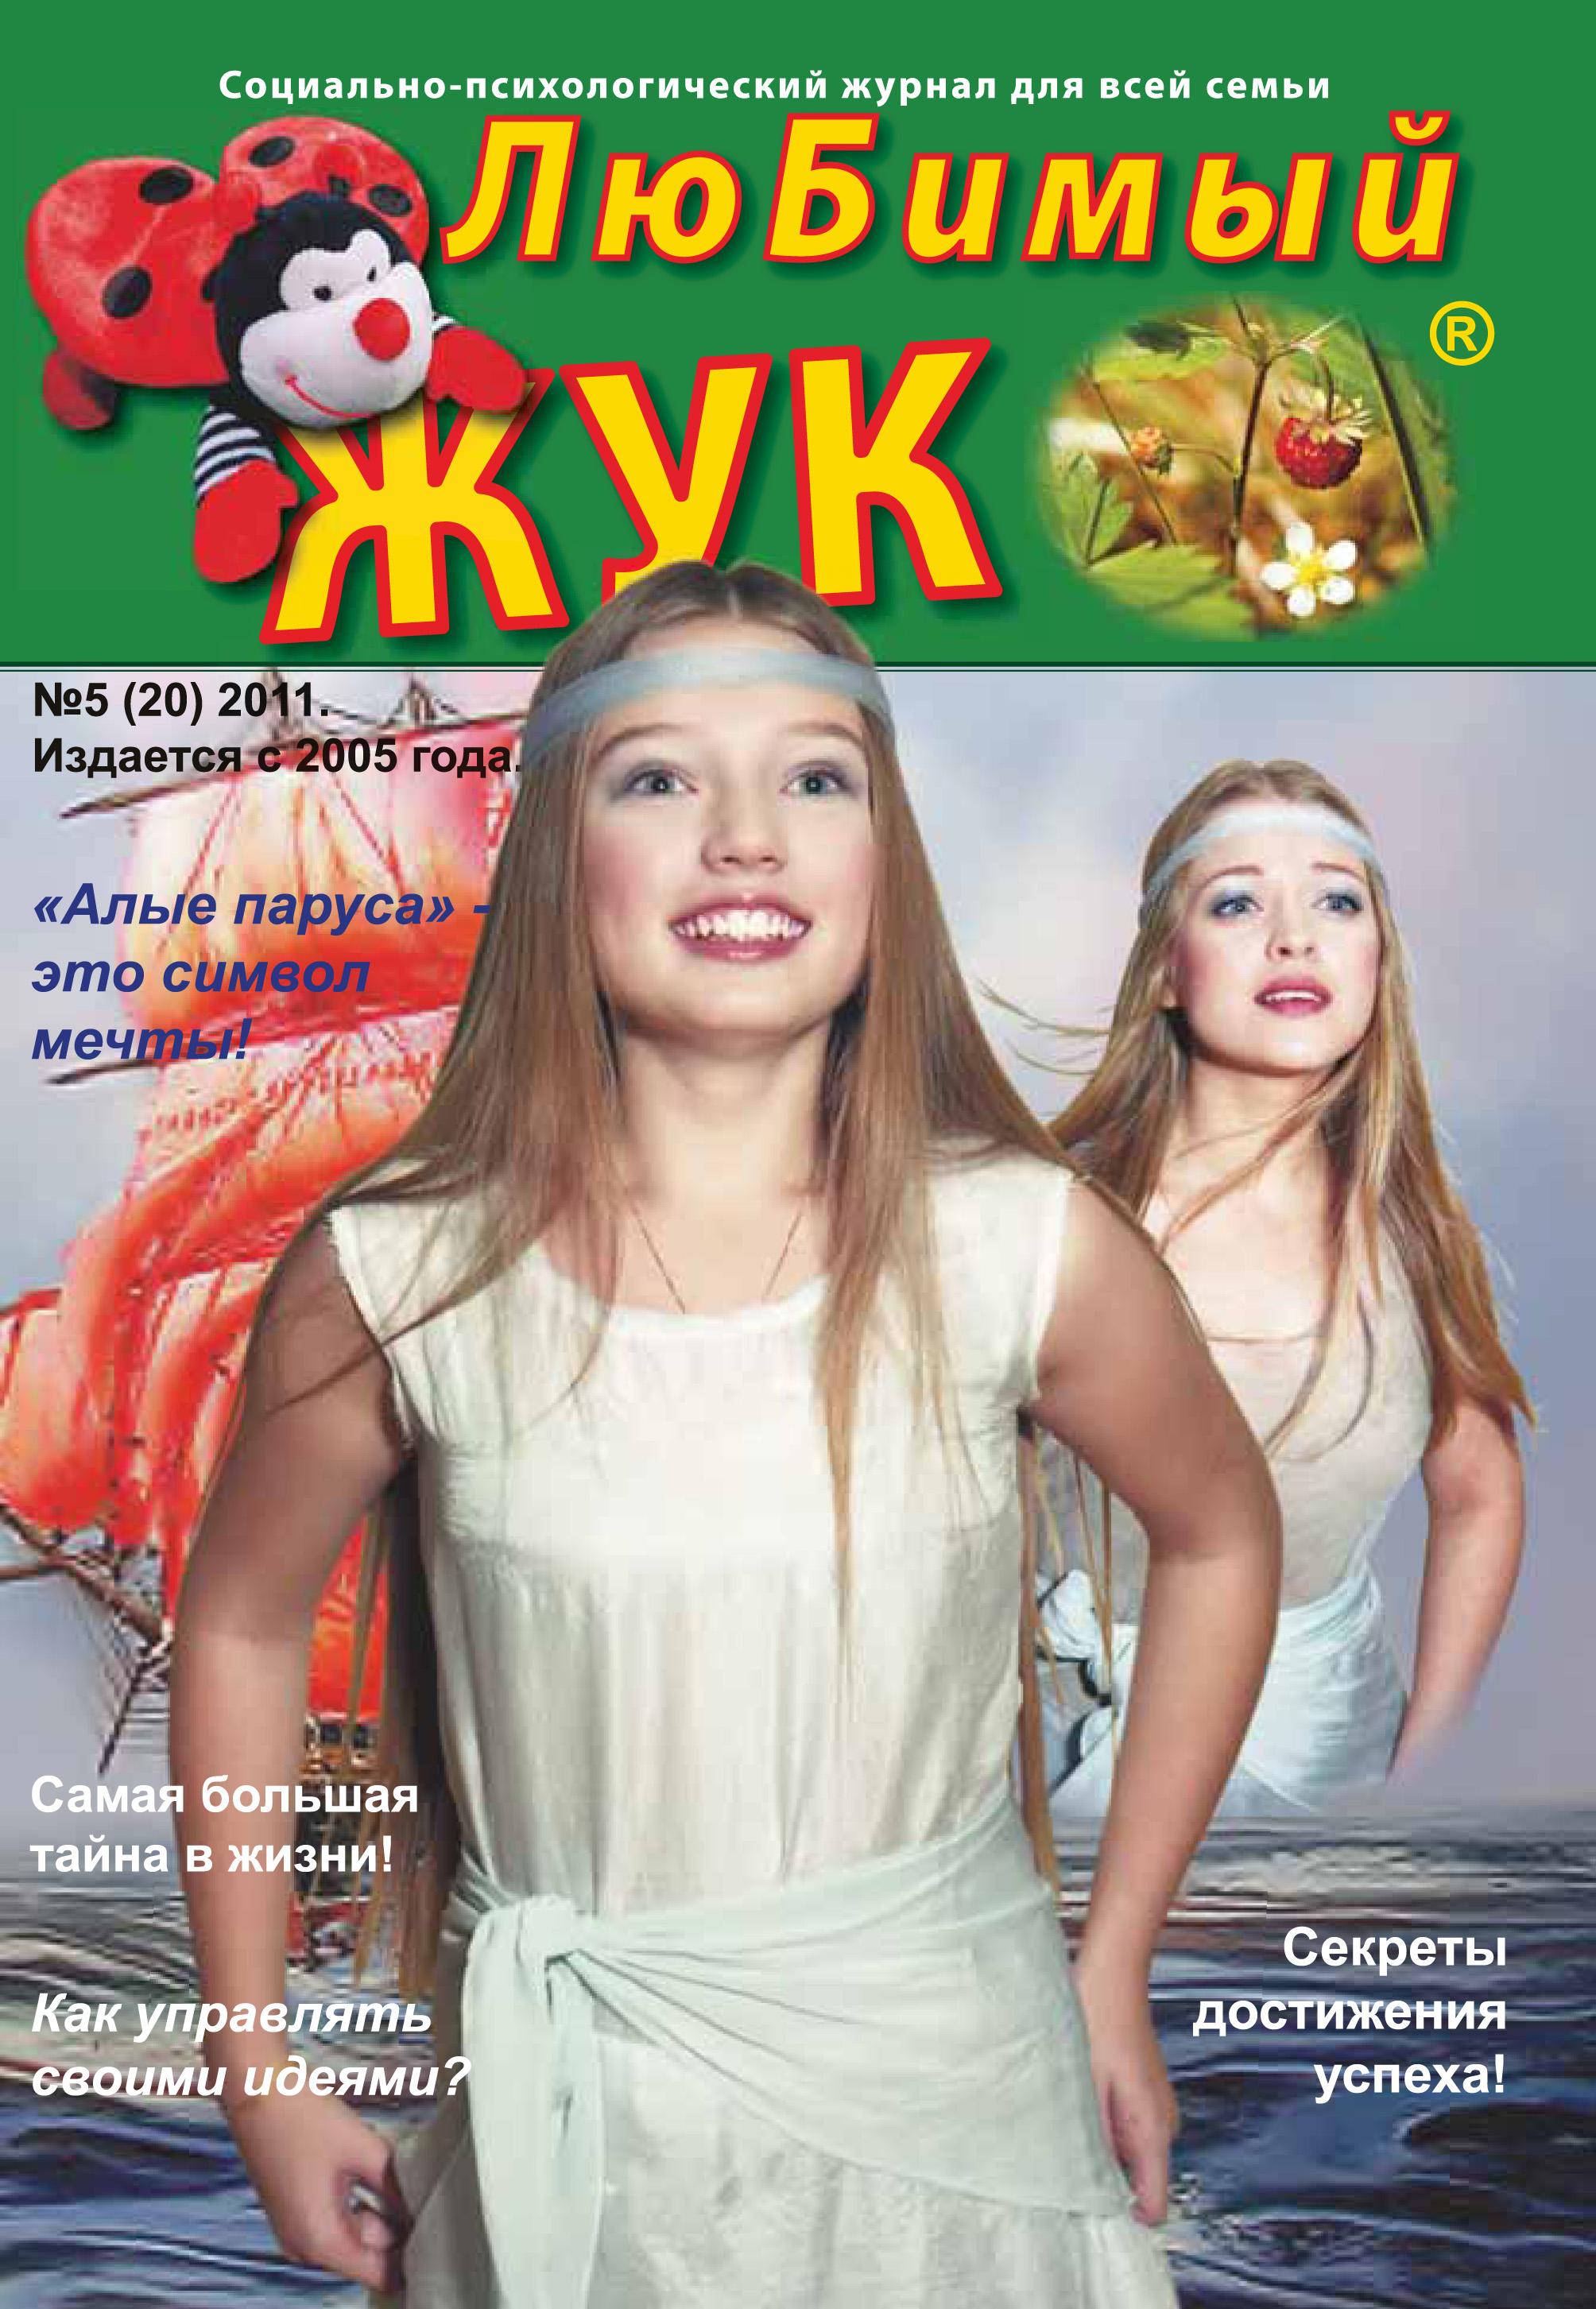 ЛюБимый Жук, №5 (20) 2011